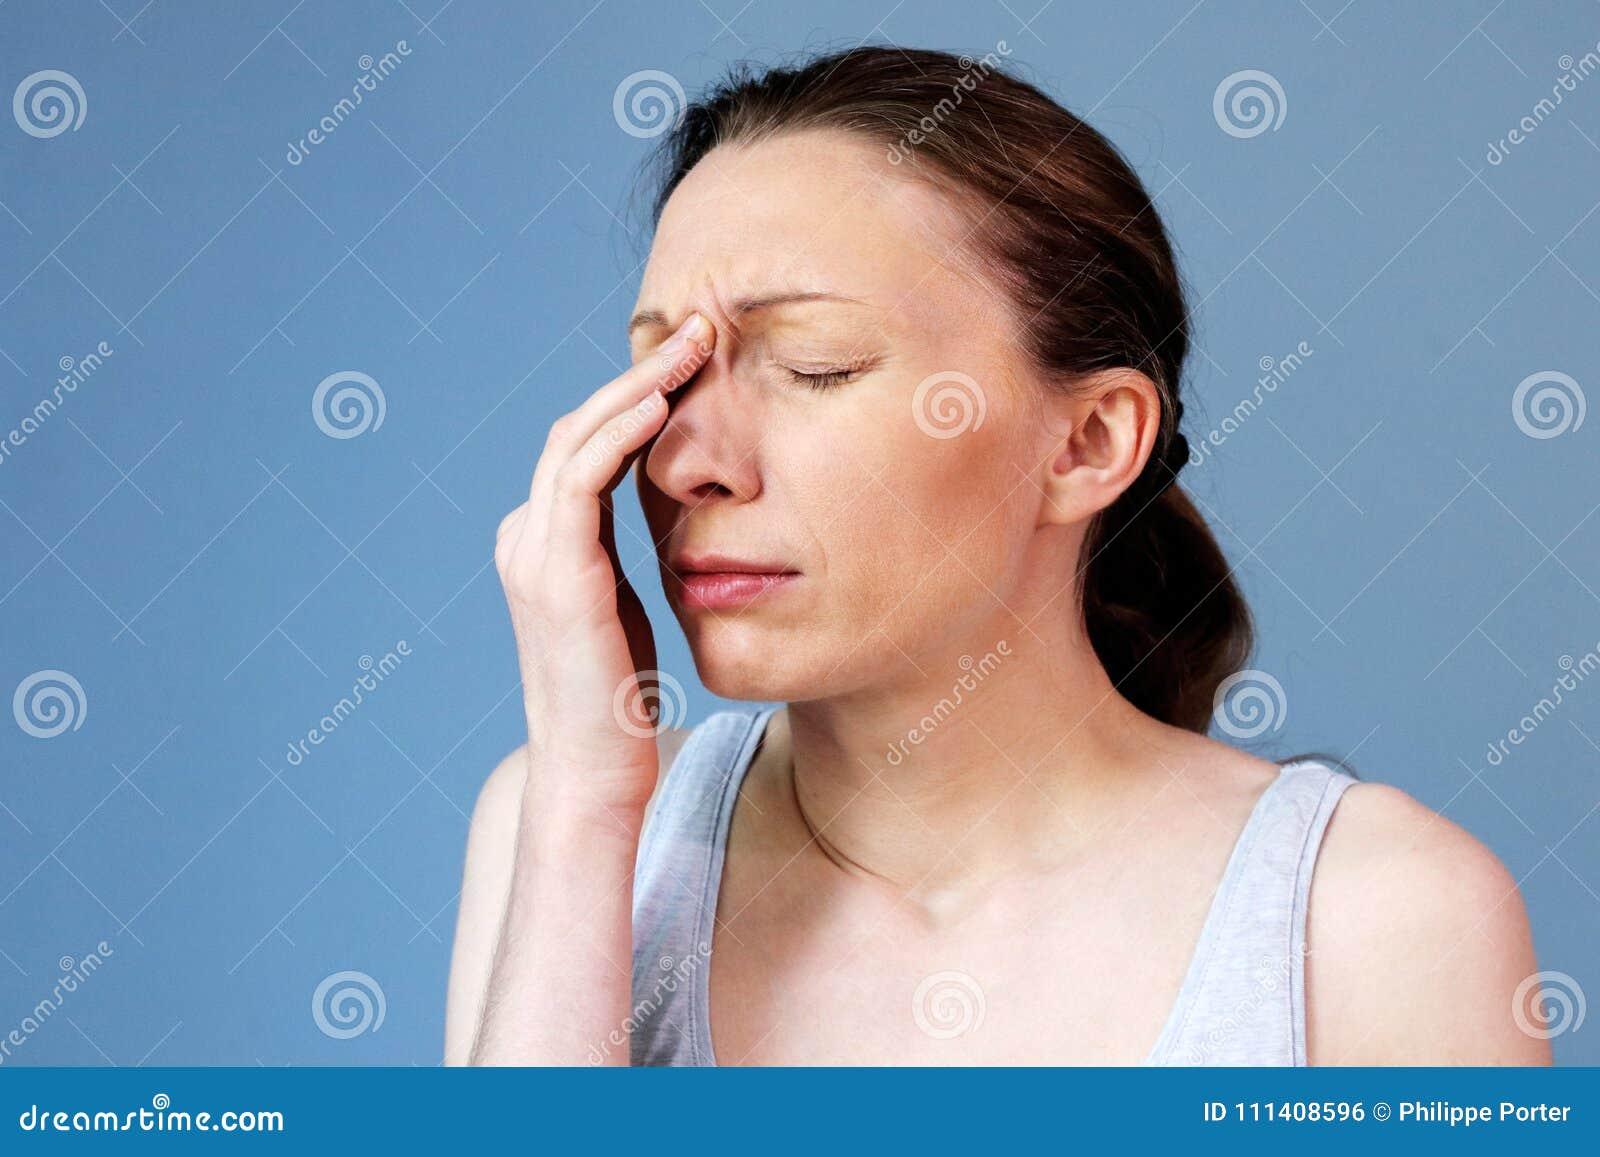 Headache Woman Work Sinus Illness Flu Cold Stock Photo - Image of